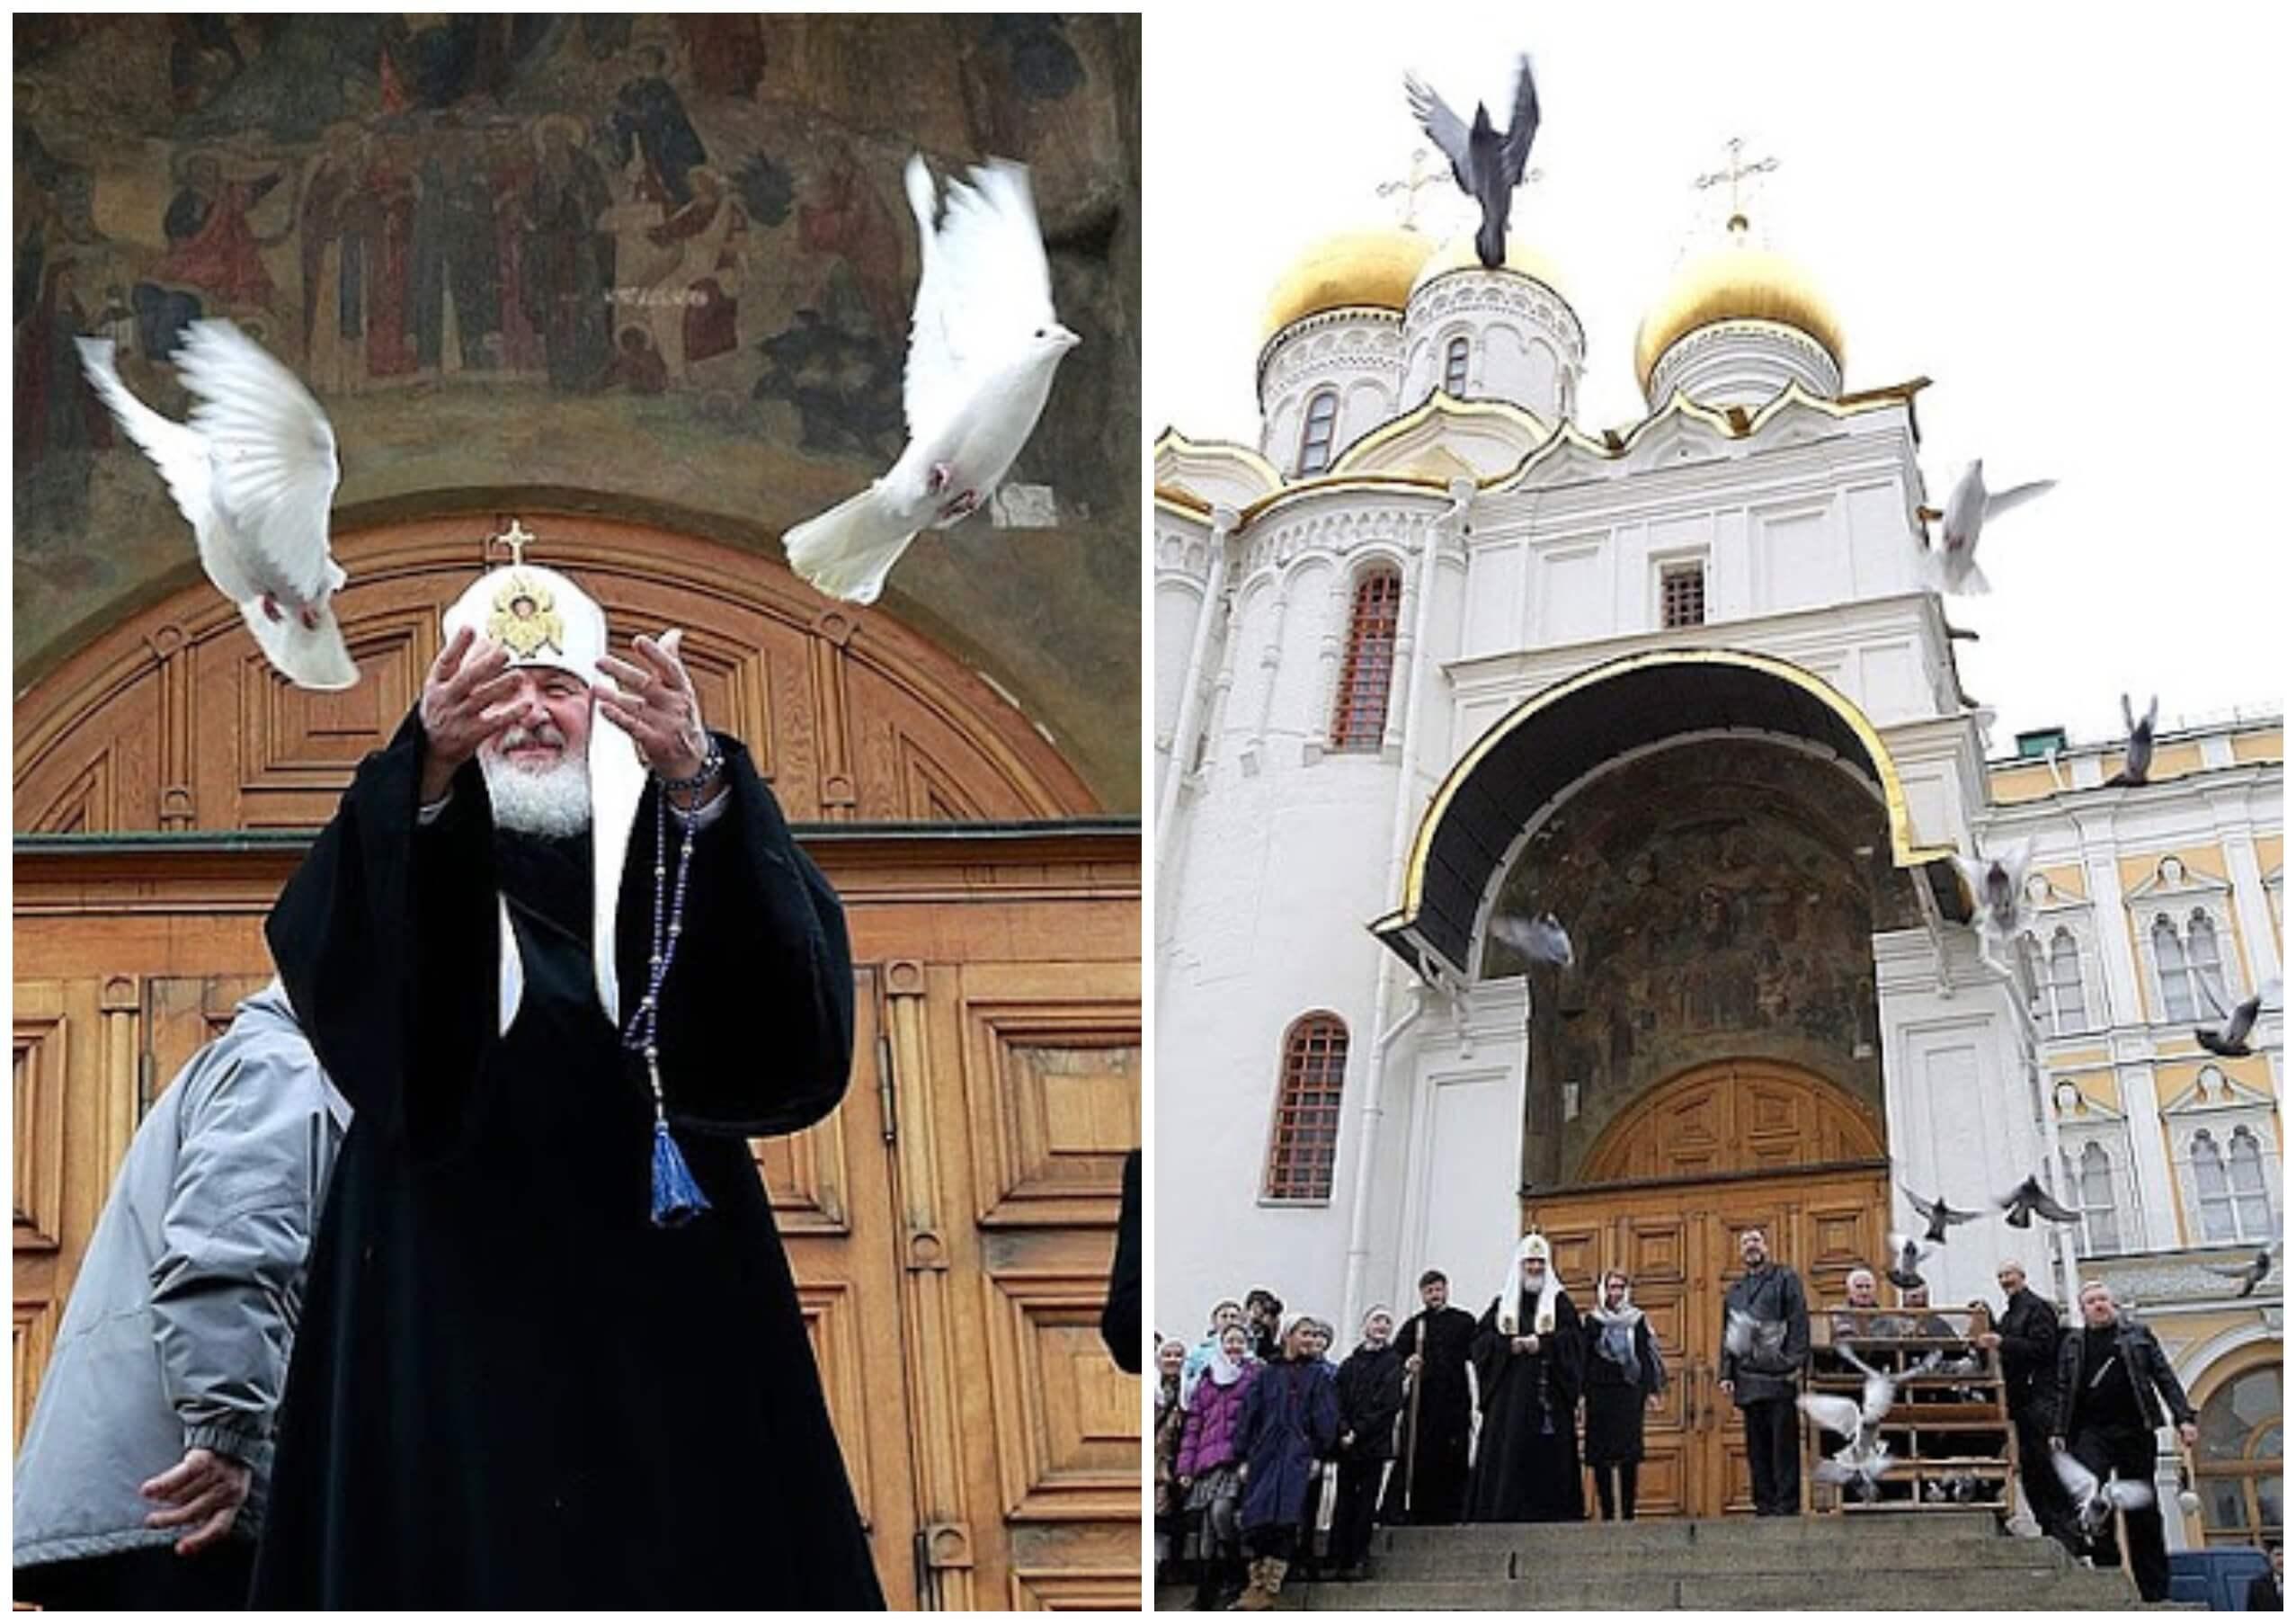 На фото изображено как патриарх запускает в небо голубей.